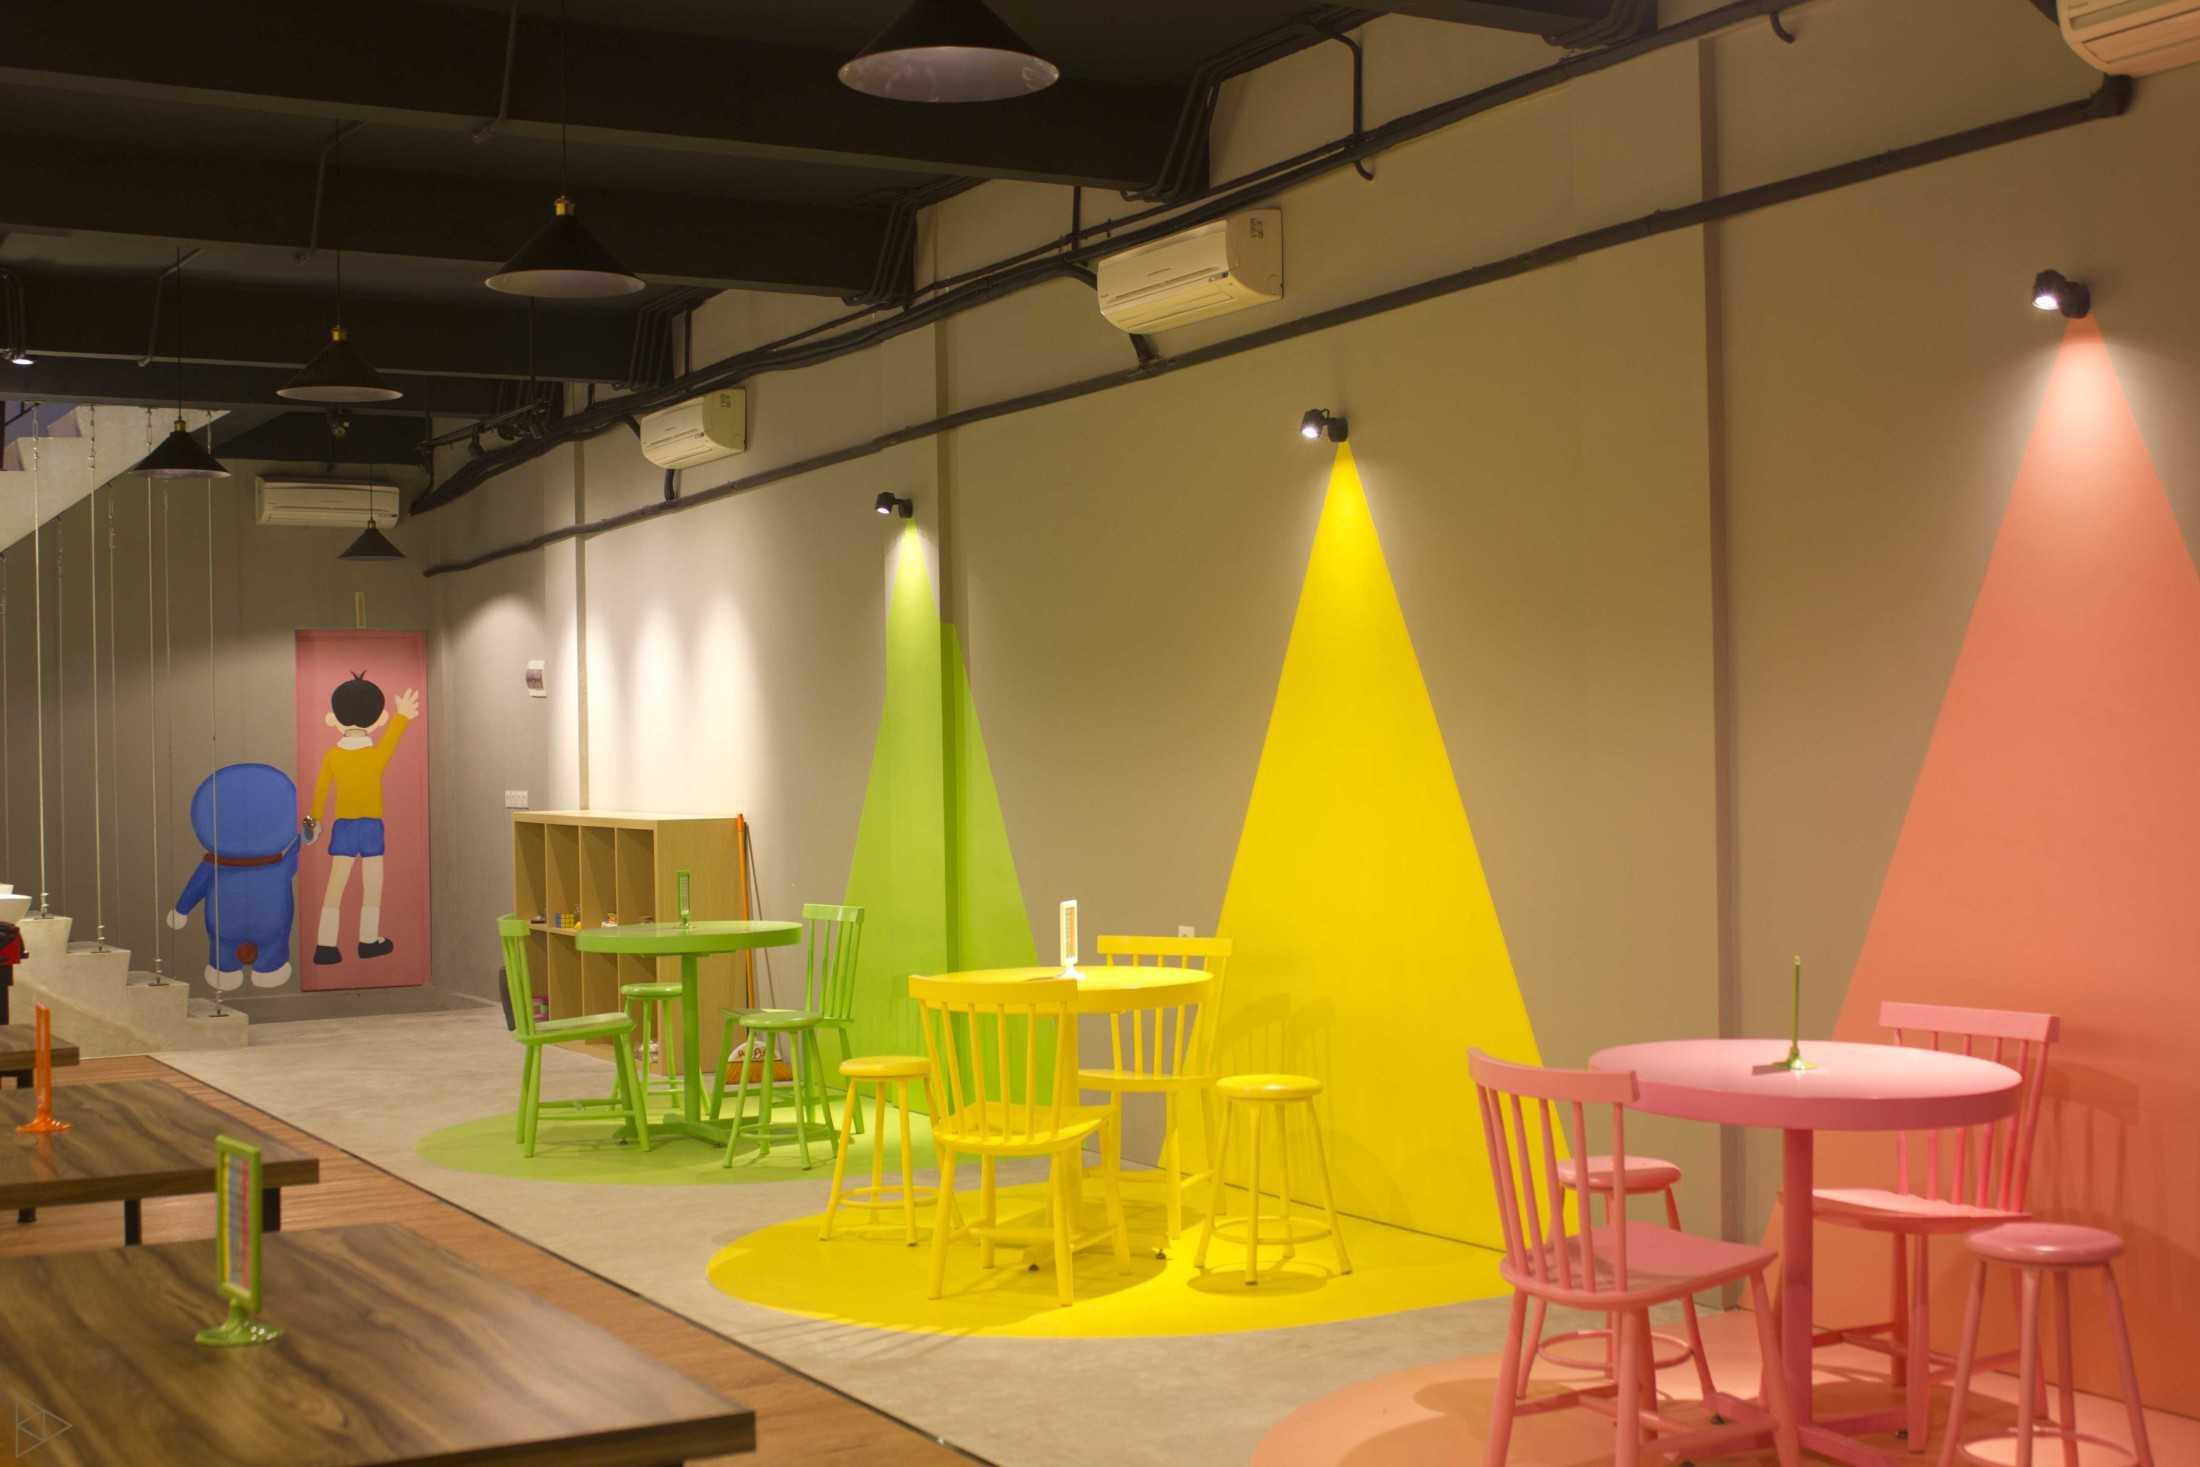 Ties Design & Build 90'S Flazback Cafe Klp. Indah, Kec. Tangerang, Kota Tangerang, Banten, Indonesia Klp. Indah, Kec. Tangerang, Kota Tangerang, Banten, Indonesia Eating Area 2 - 2Nd Floor  68657